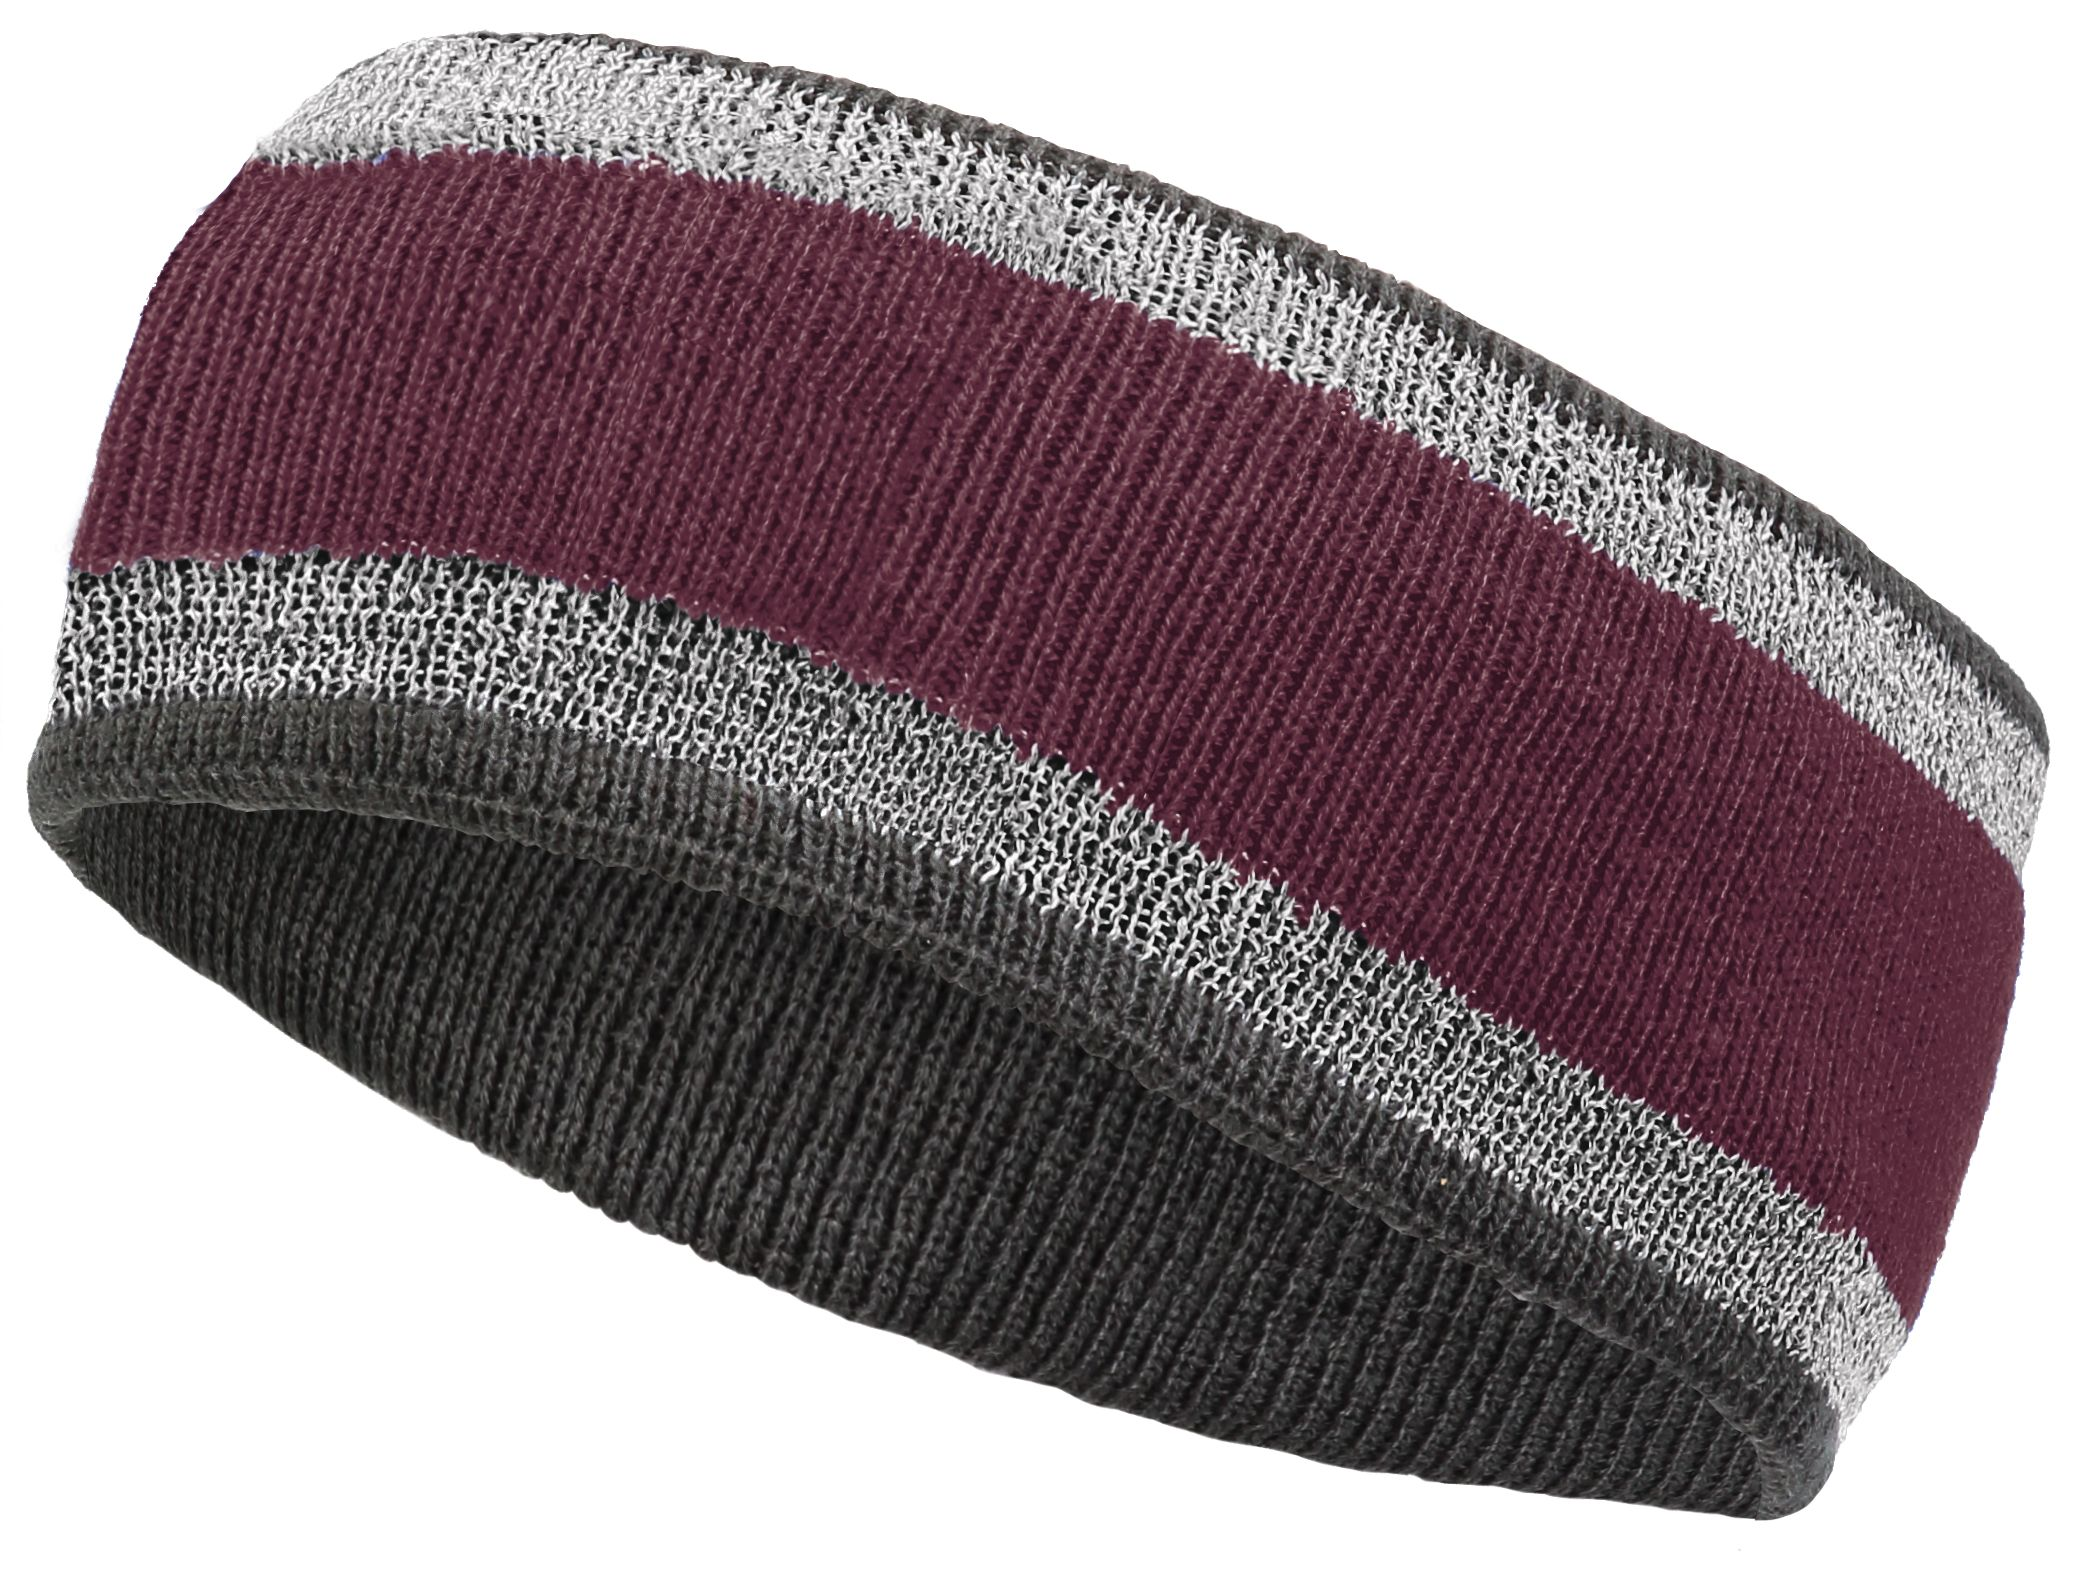 Reflective Headband - MAROON/CARBON